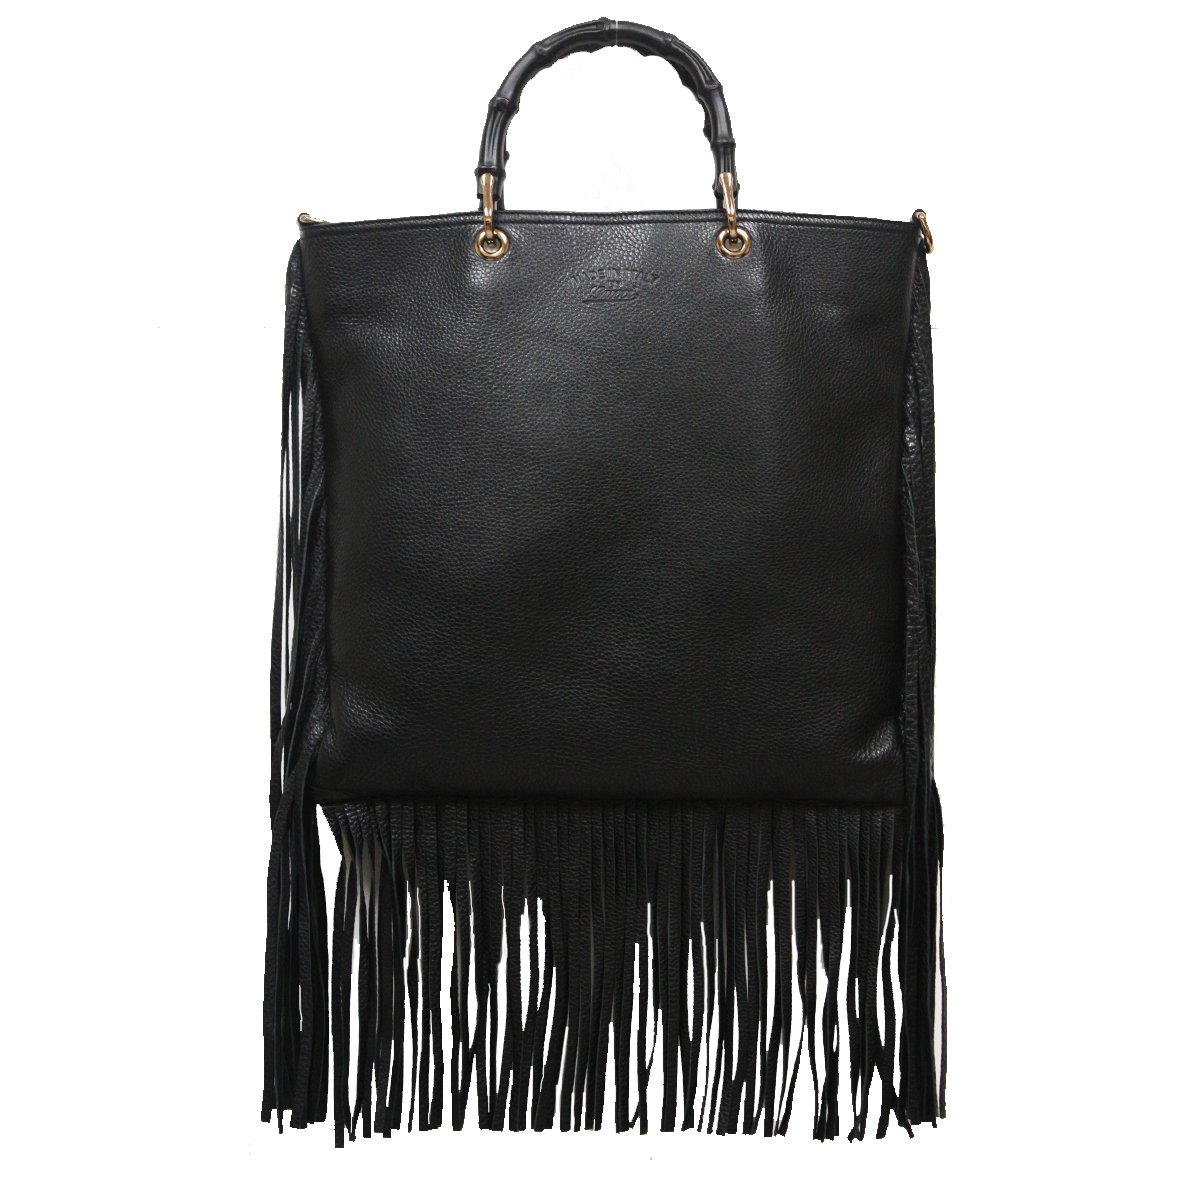 0b45ecc44c62 Amazon.com: Gucci Bamboo Shopper 2-Way Black Leather Fringe Hobo Bag 349195  A7M0V 1000: Shoes